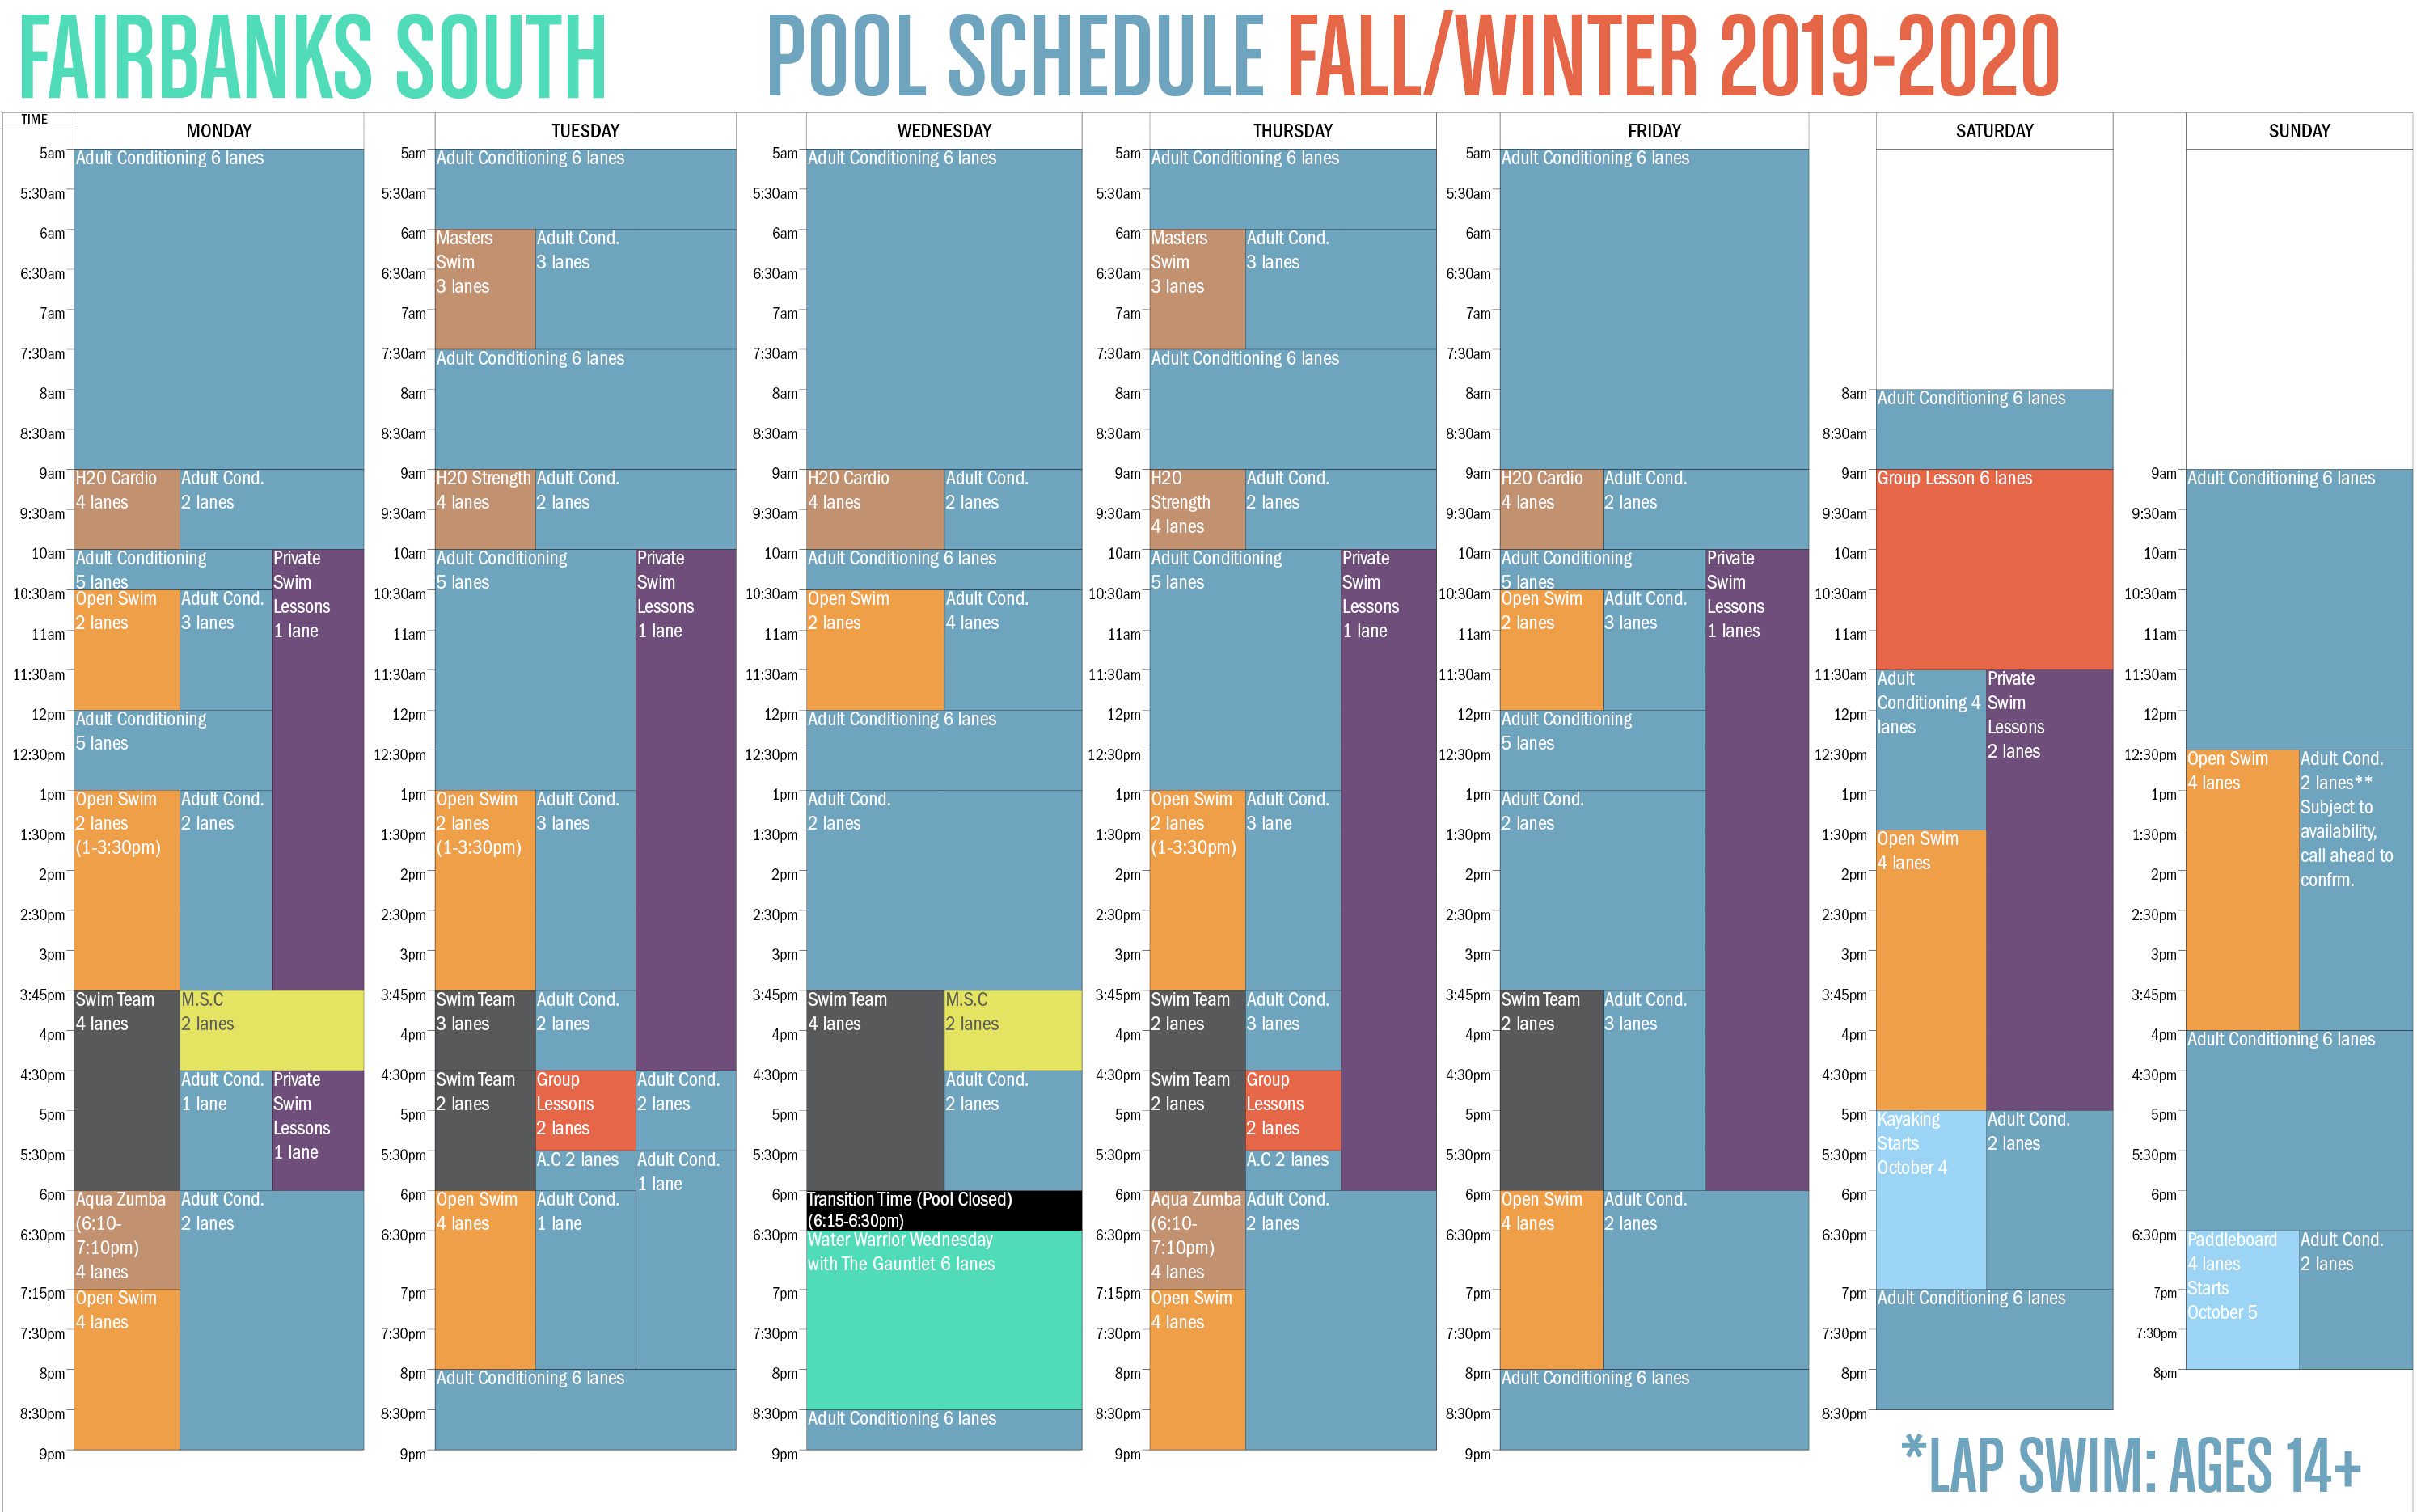 Q4-Q1 Fall-Winter FBX Pool Schedule [WEB]